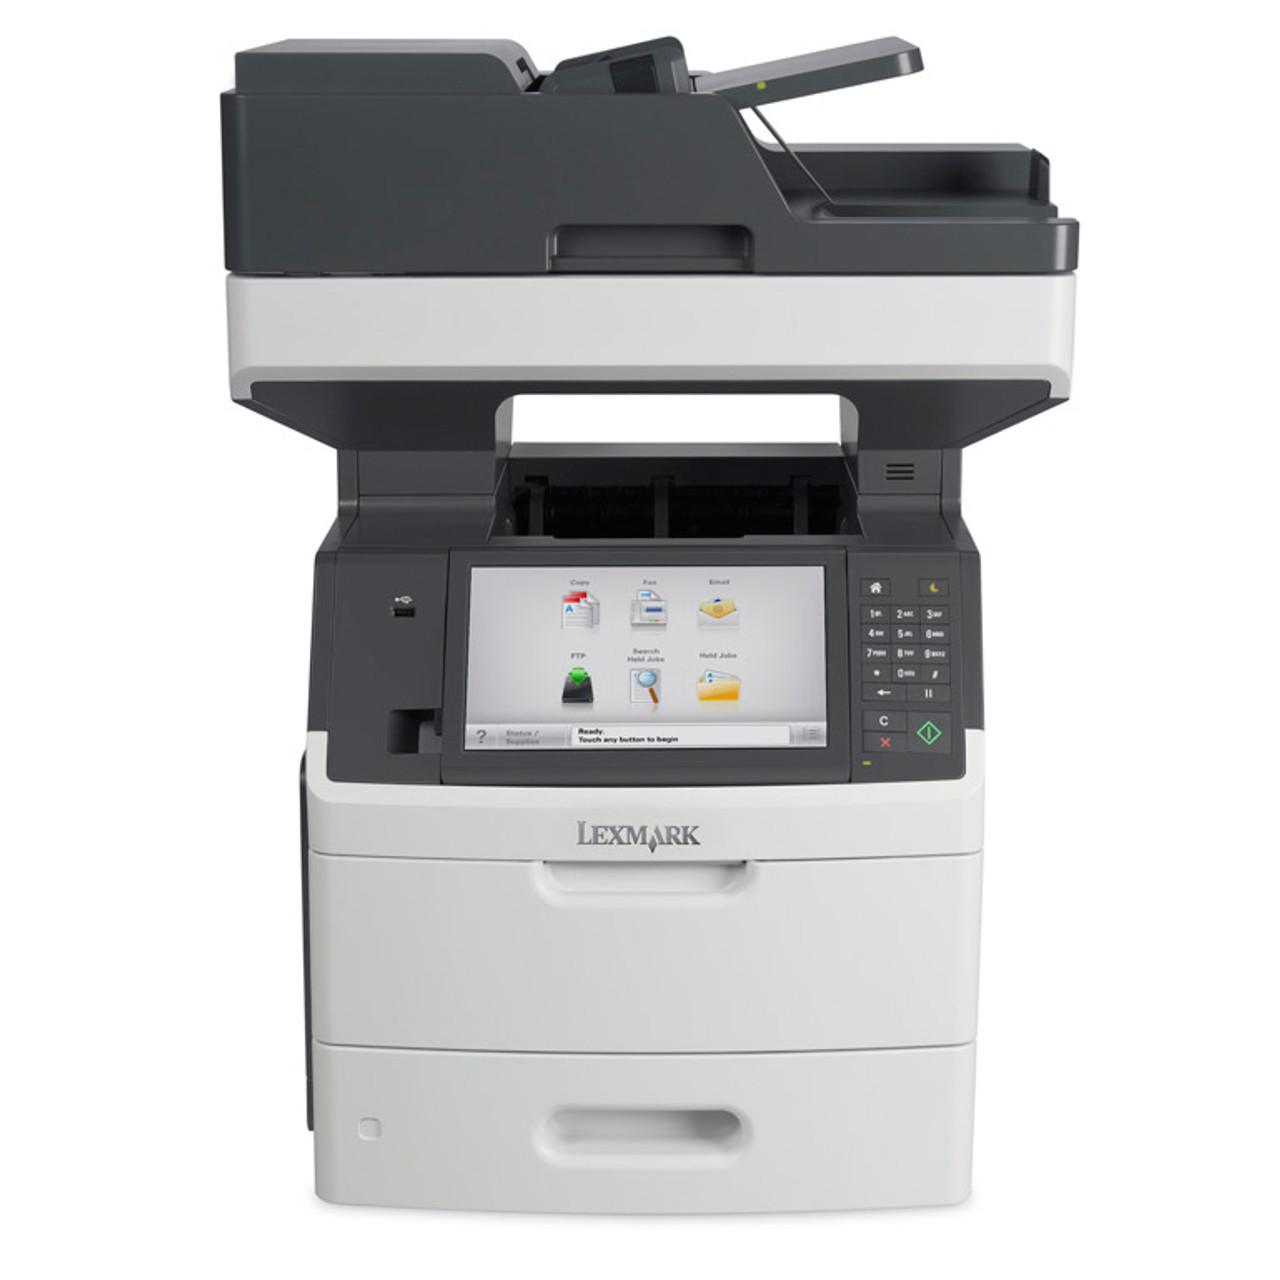 Lexmark MX711de Monochrome Laser - Fax/copier/printer/scanner